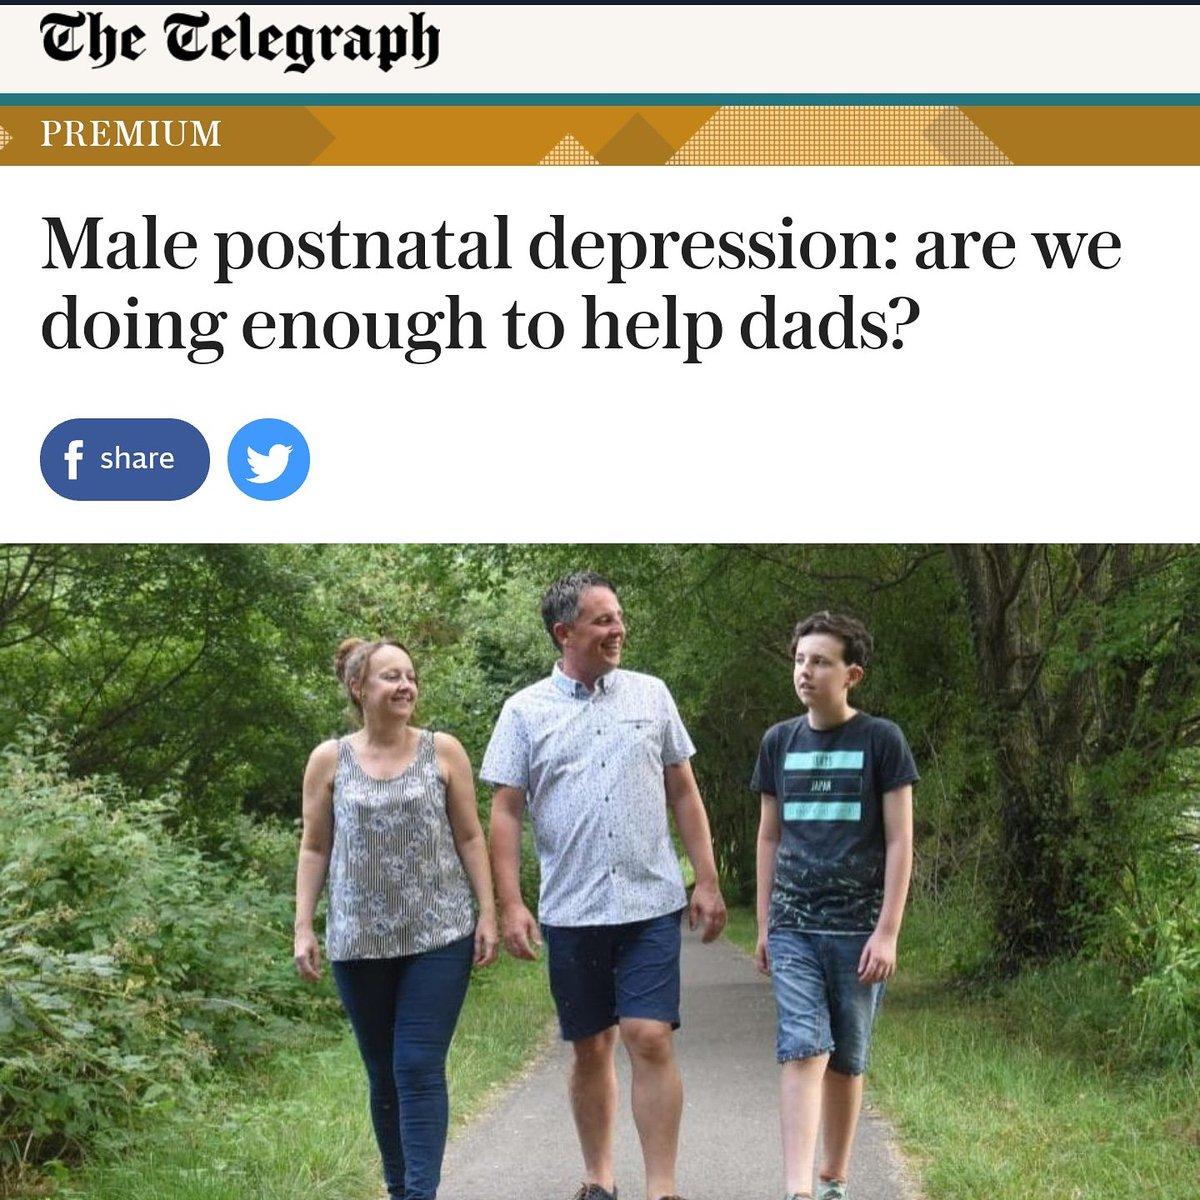 fatherhood mental health a twitteren thank you vjhanley and